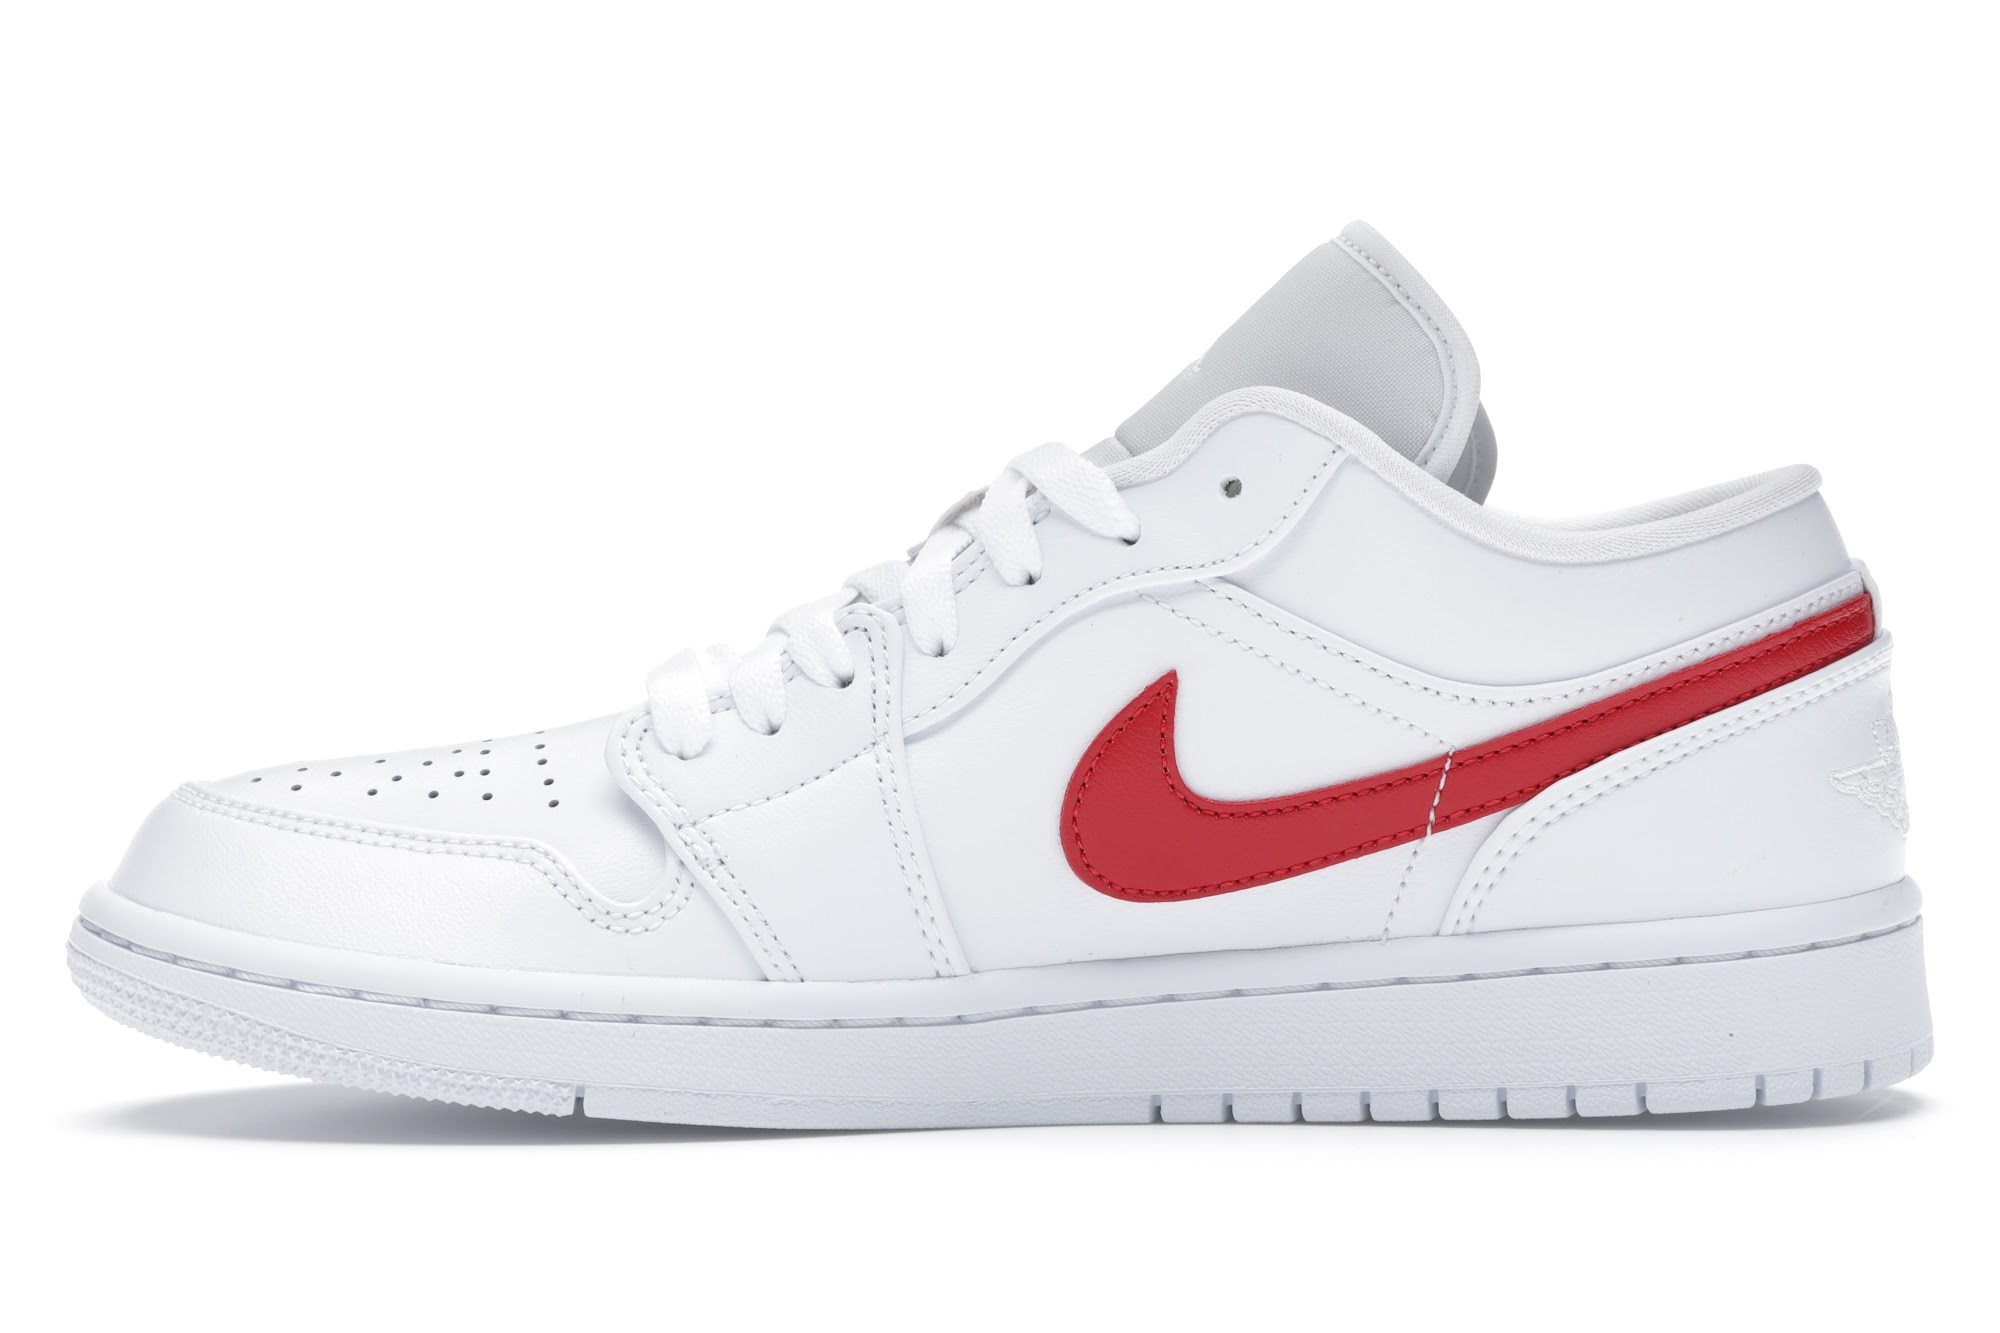 Jordan 1 Low White University Red (W)